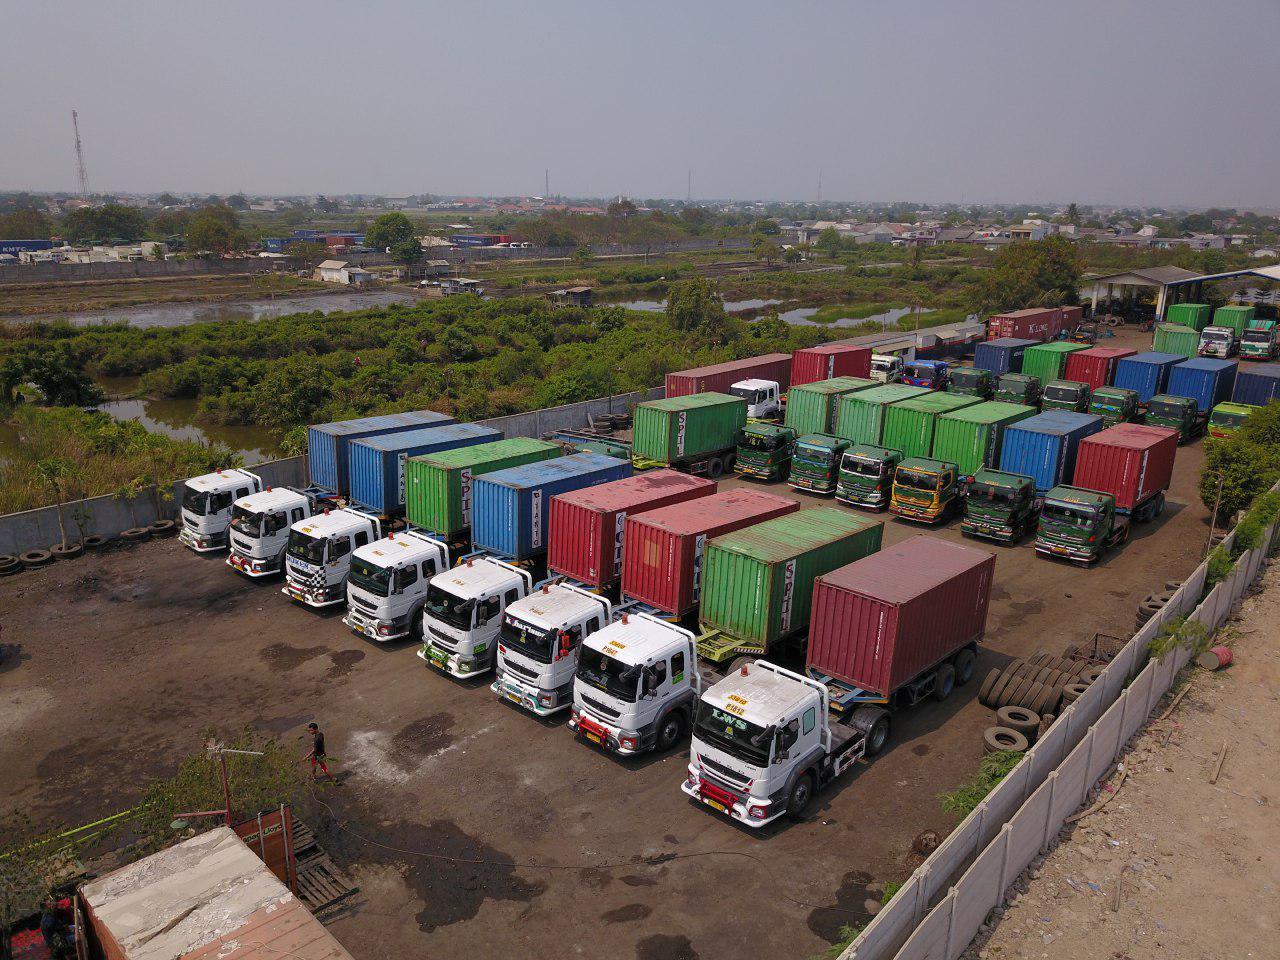 Jasa Ekspedisi Emkl Freight Forward Domestic Intl Ongkos Kirim Transporindo Home